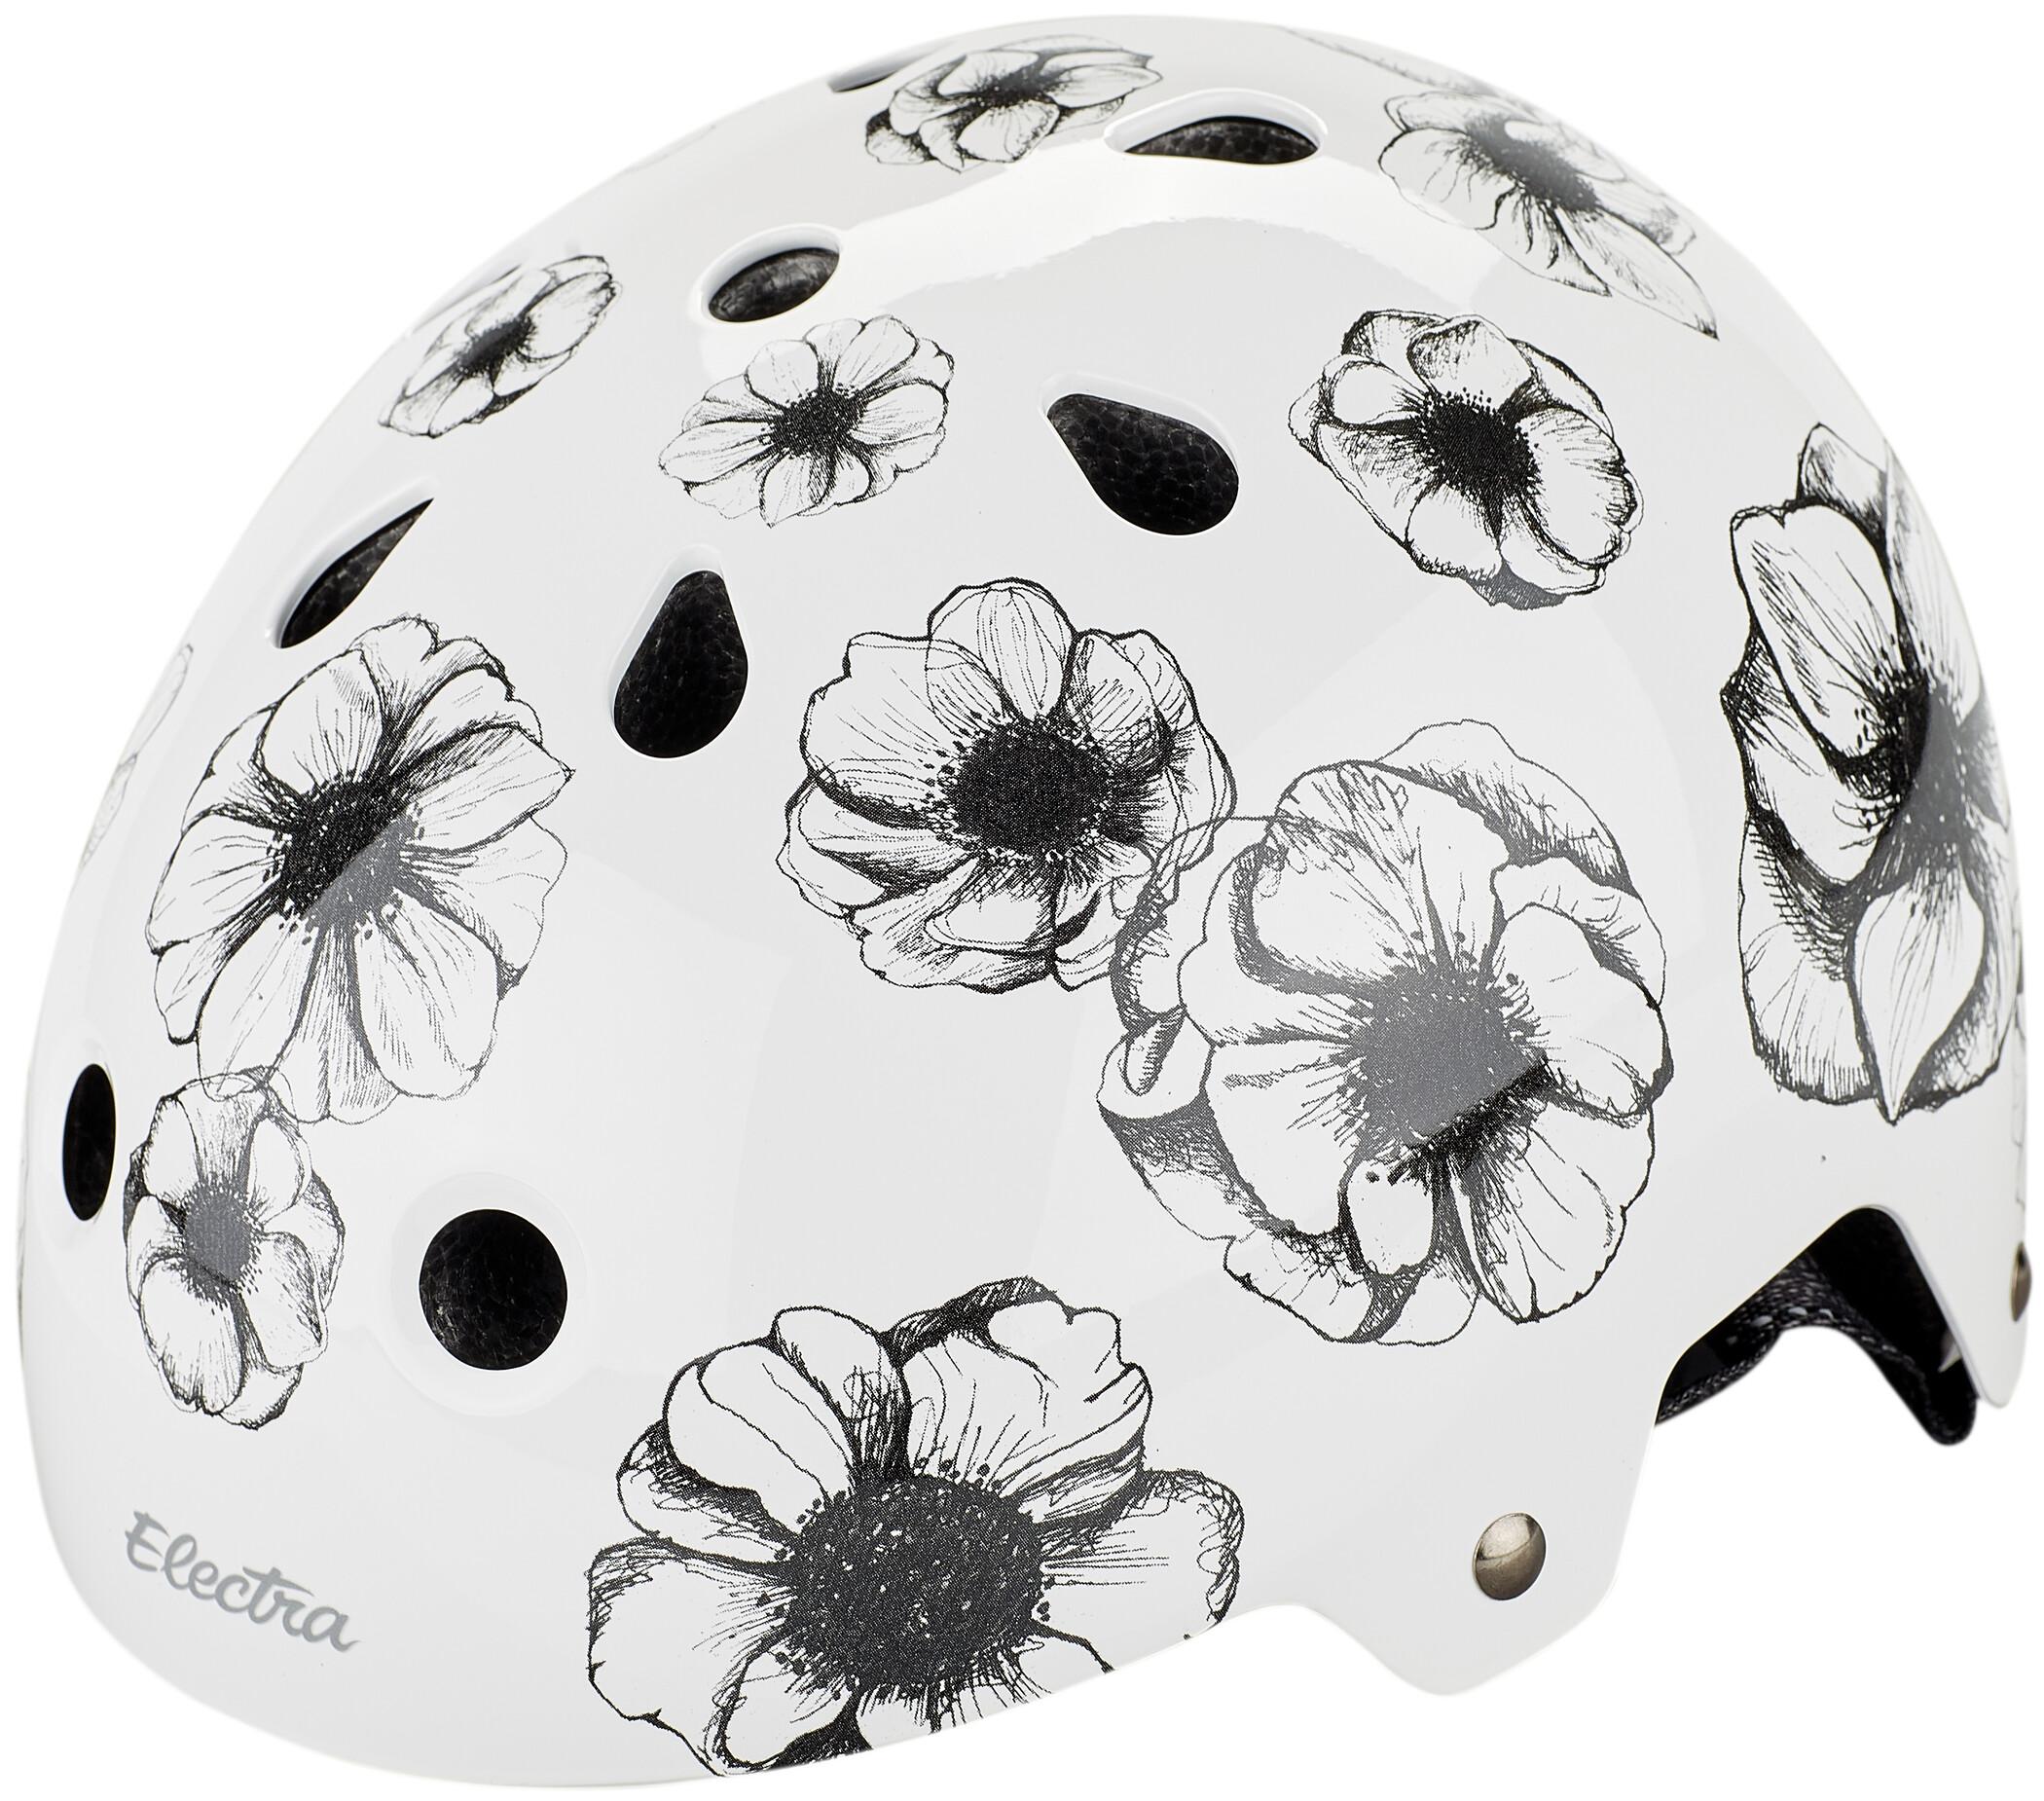 Electra Bike Cykelhjelm Børn, flowers | Hjelme